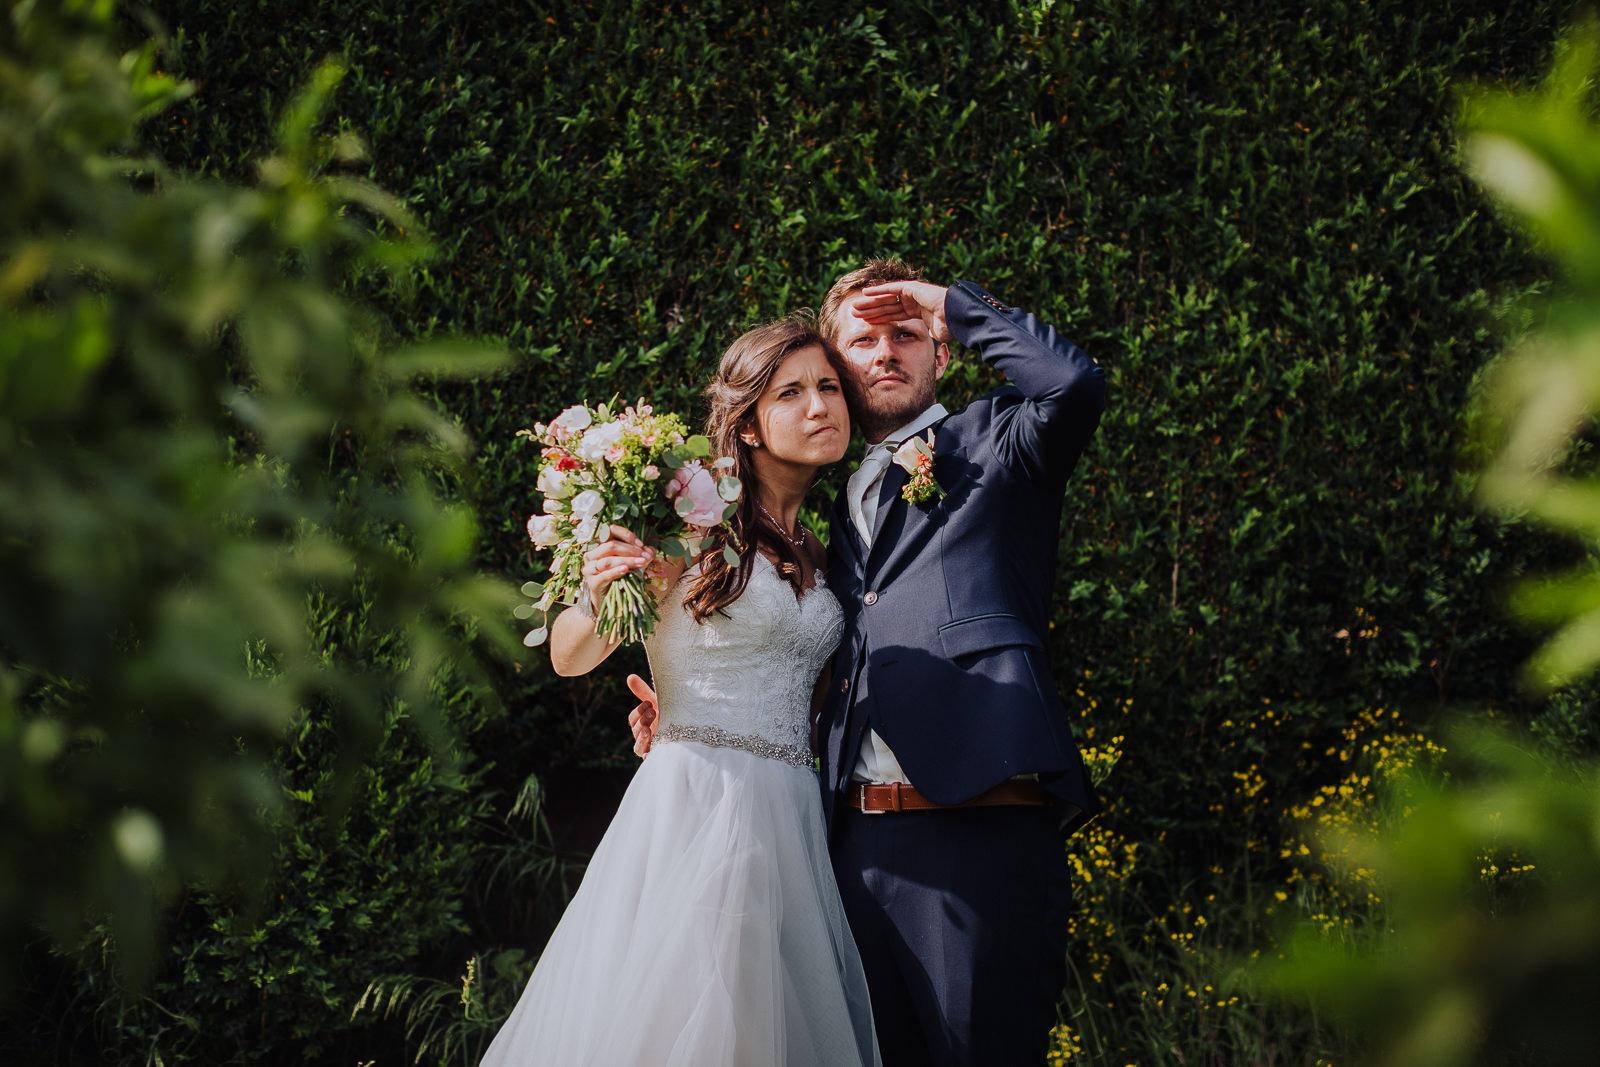 wedding_quinta_santana_mafra_portugal_052.jpg